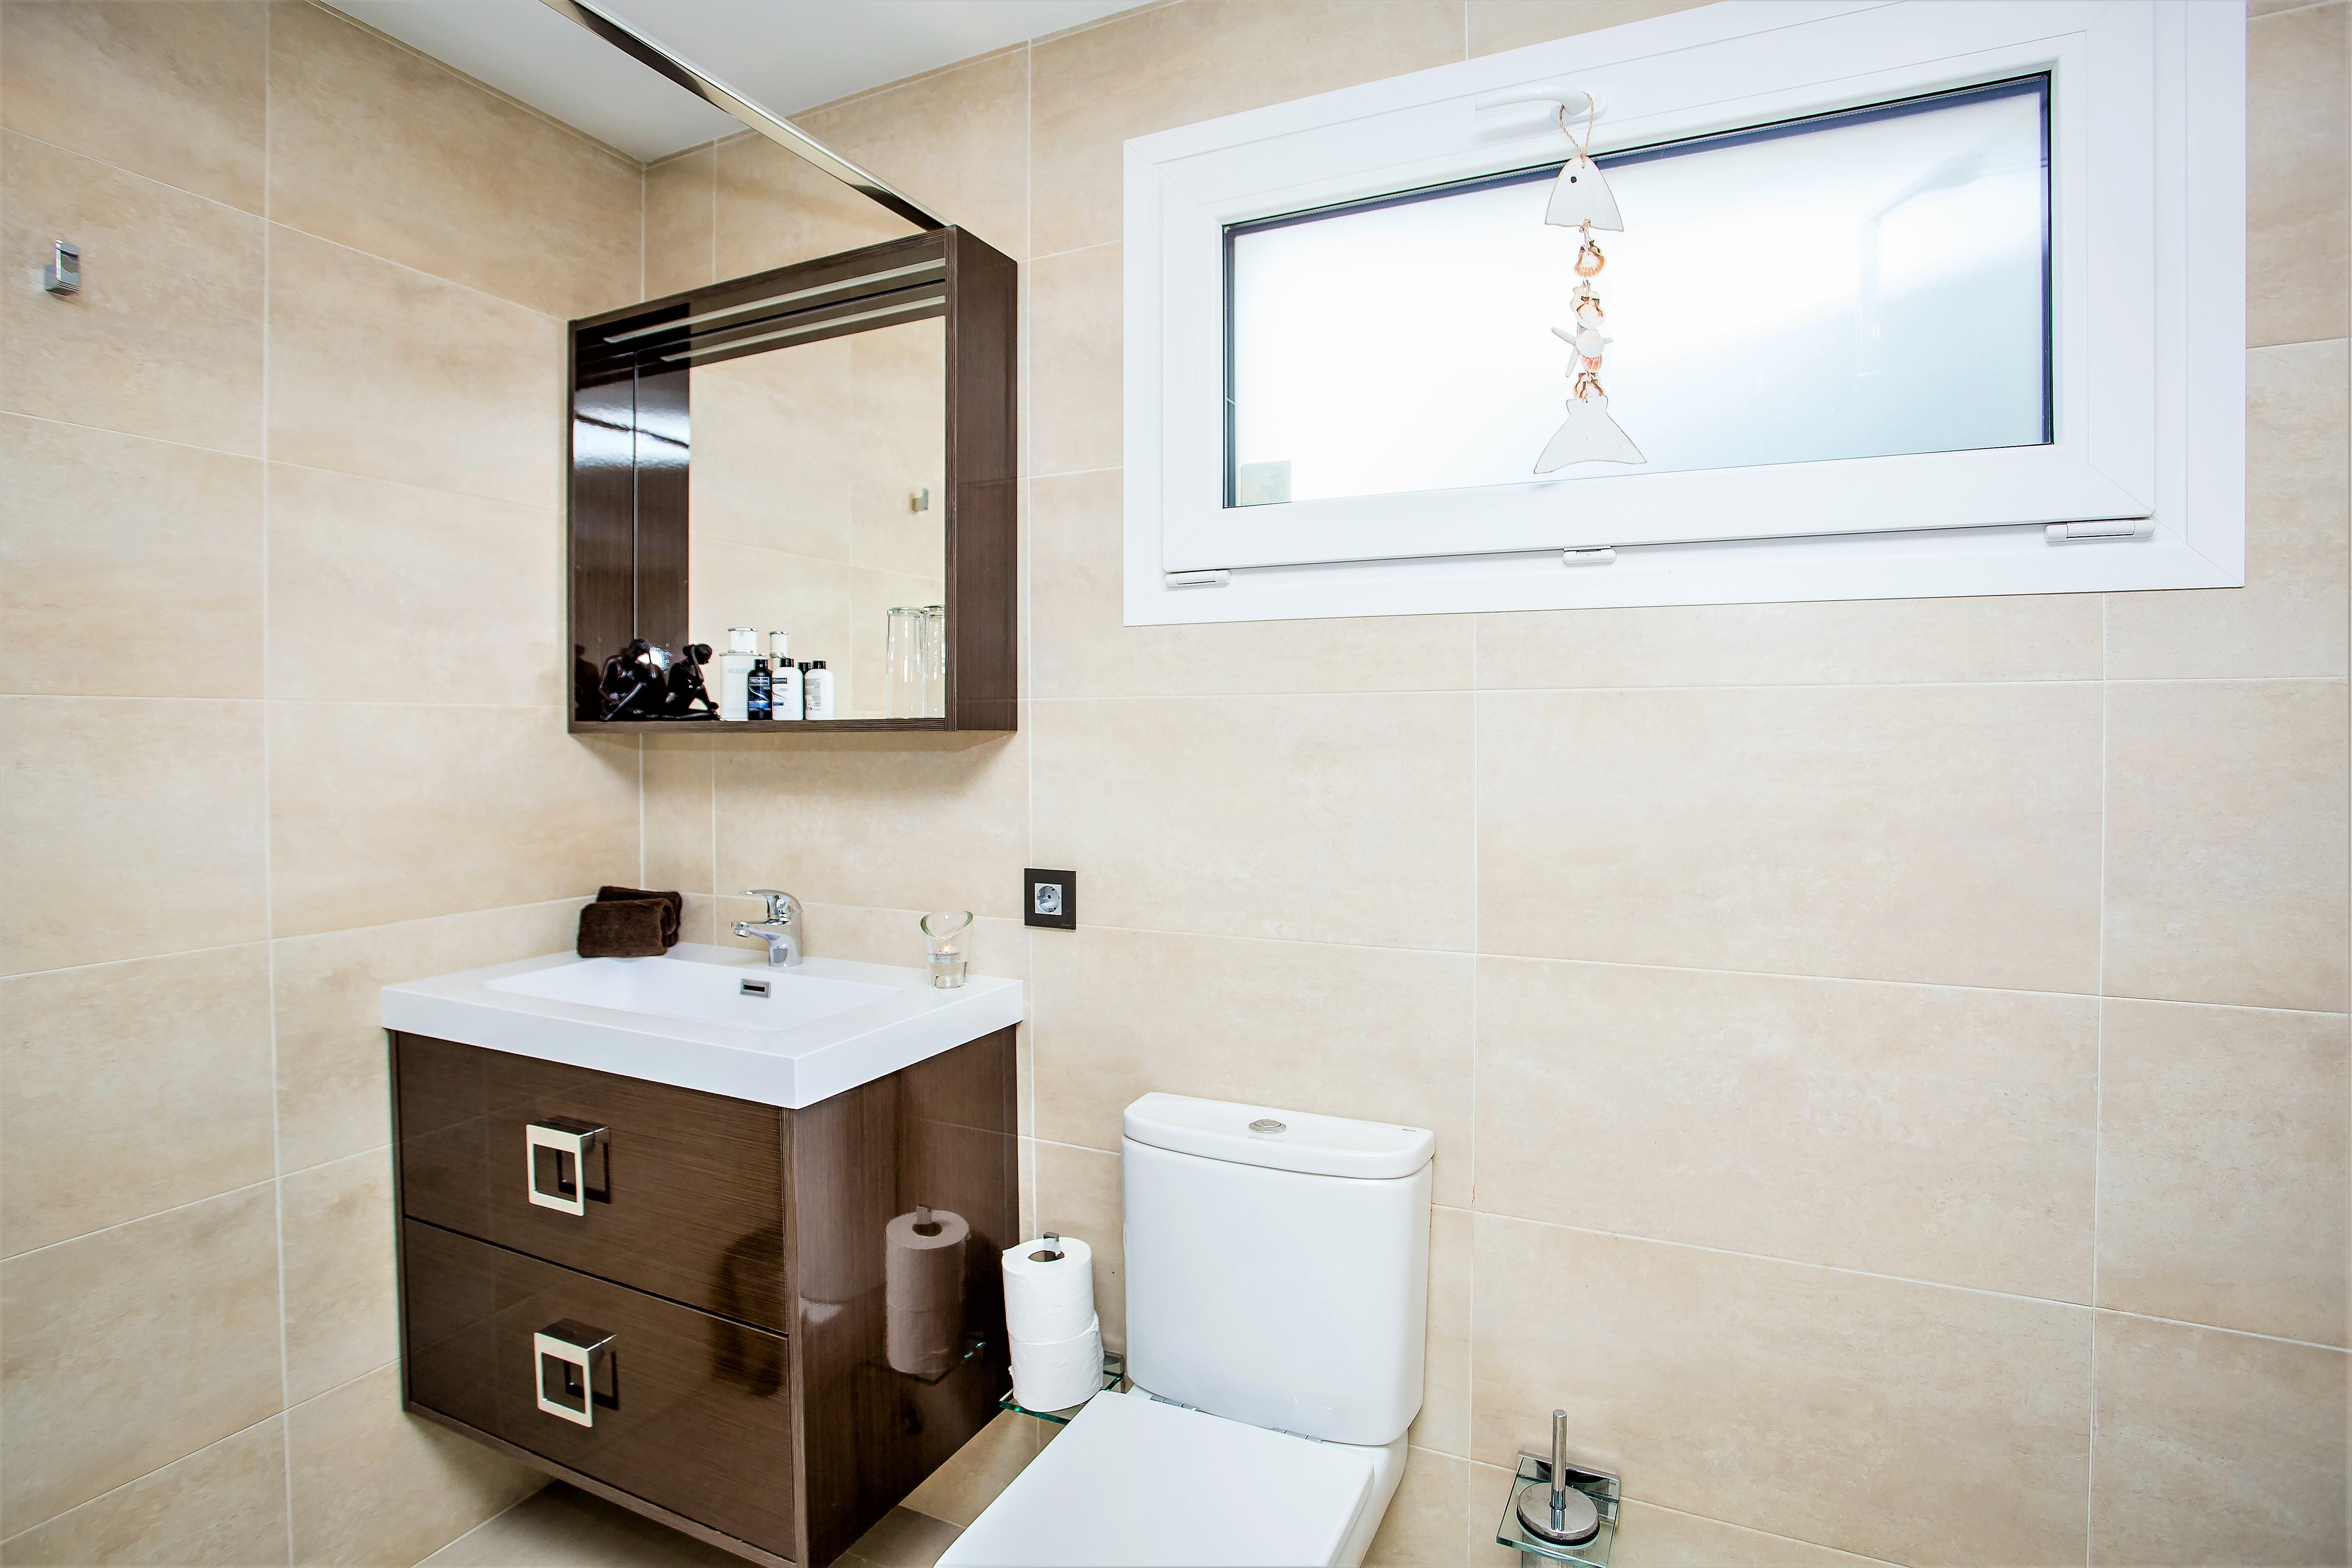 Apartment 8 Bedroom VILLA BY PUERTO BANUS   SEA 5 min                                photo 20286066